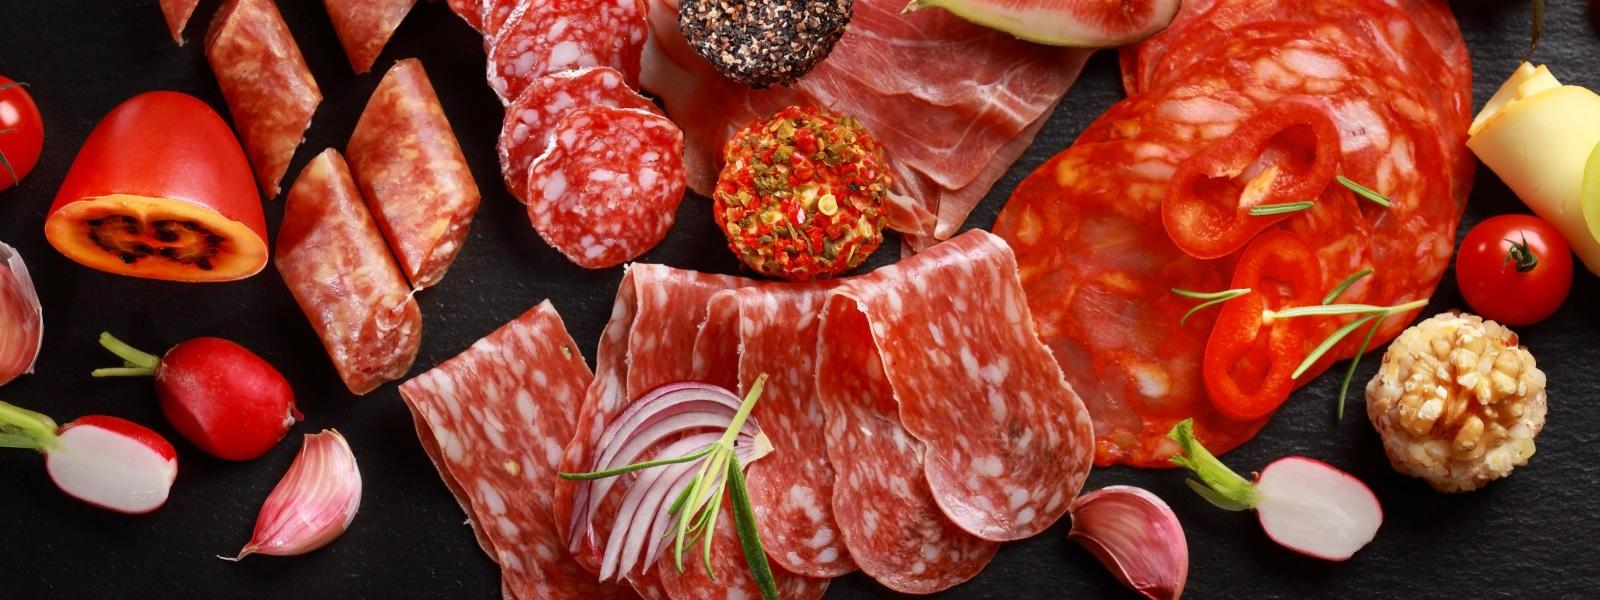 Tasty-Meat-Platter